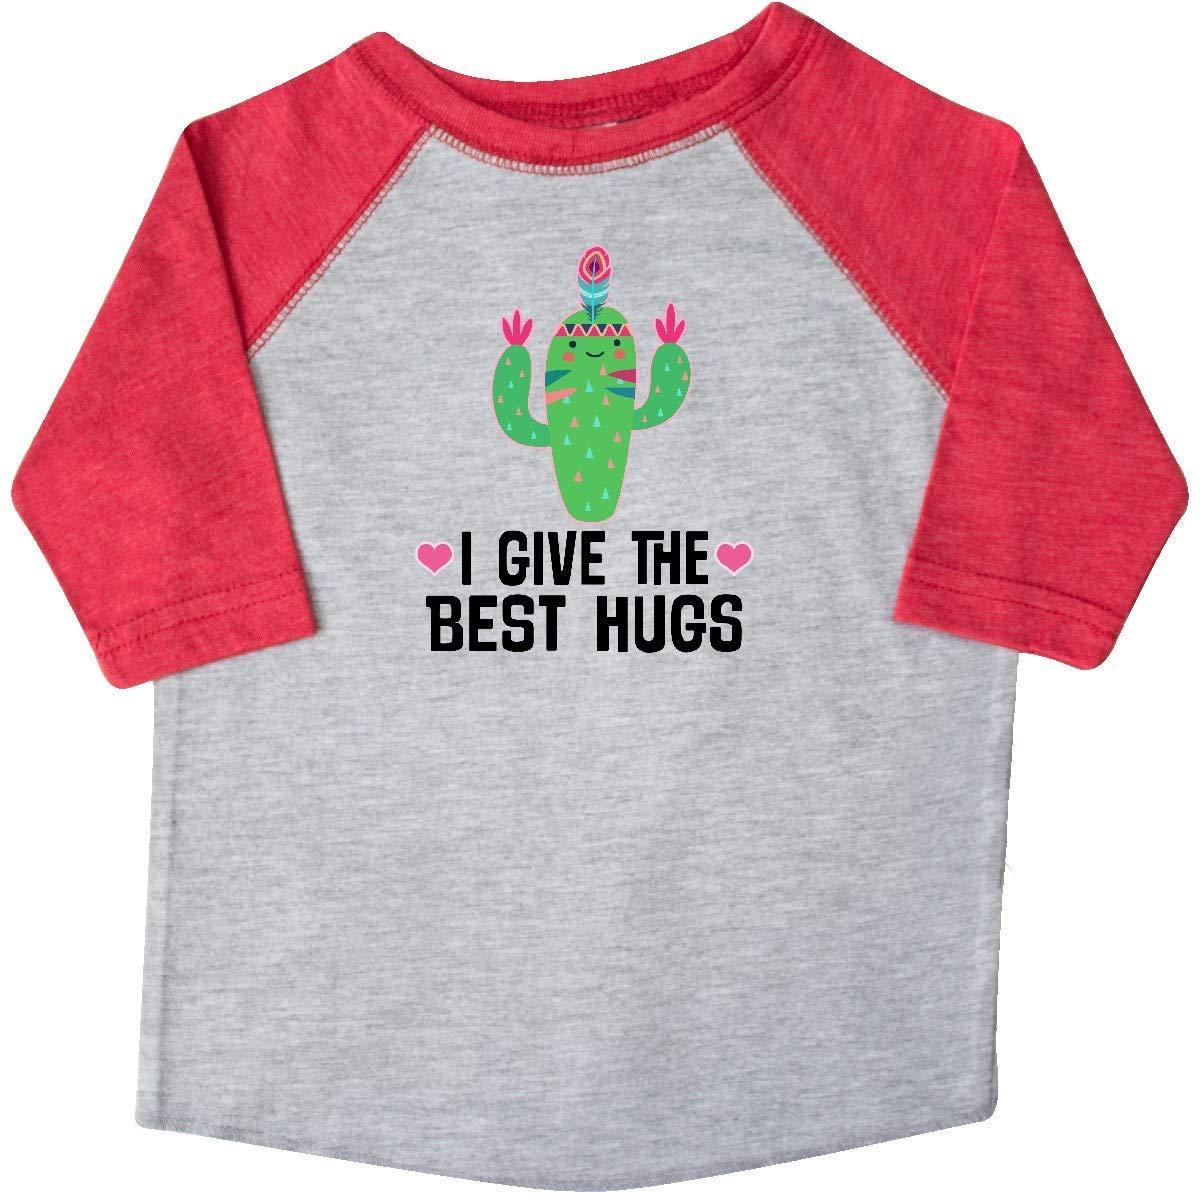 inktastic Cactus Cute Girls Best Hugs Toddler T-Shirt